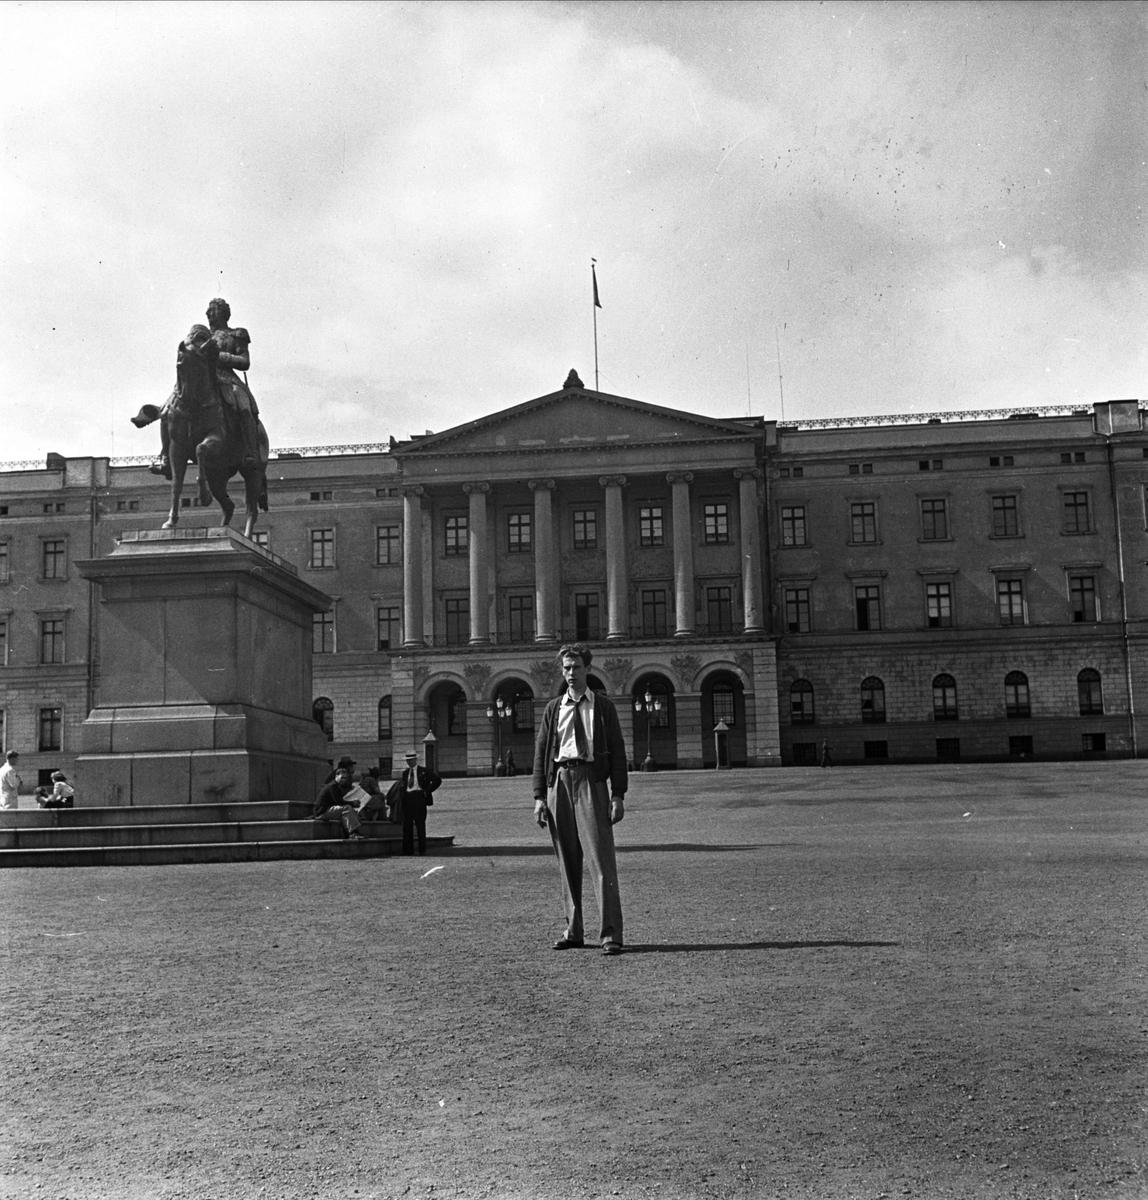 Det Kongelige Slott, Oslo, Norge 1947